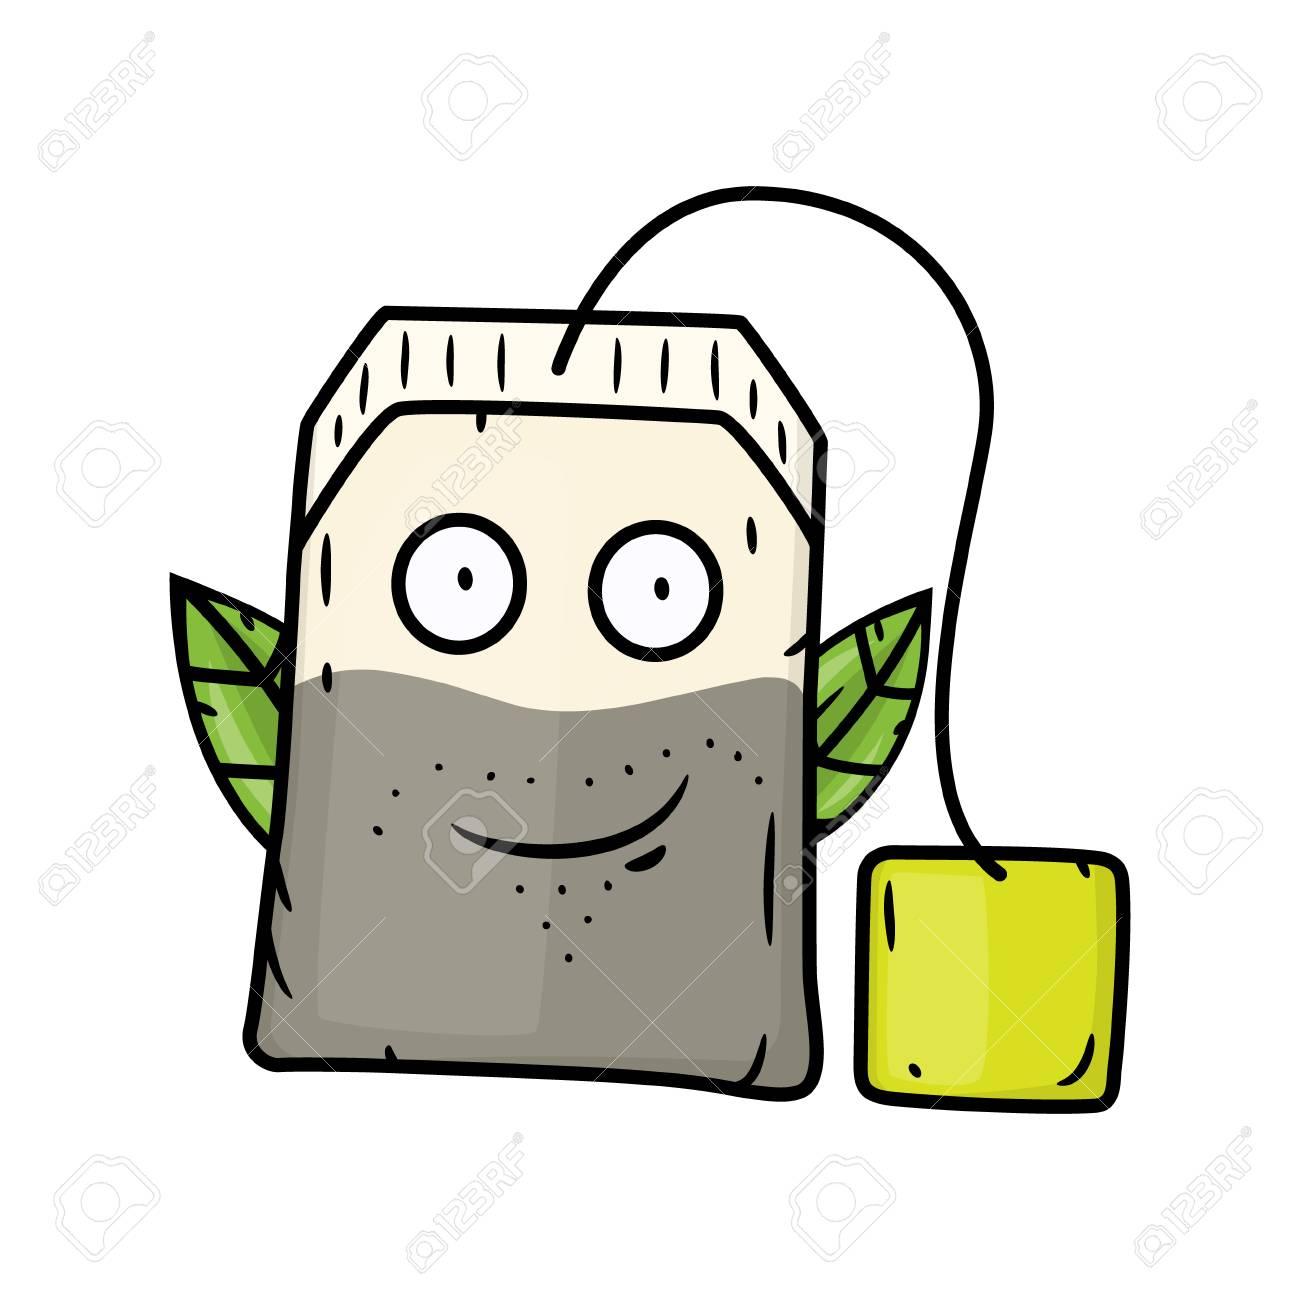 Cartoon Tea Bag Vector Cartoon Comic Characters Royalty Free Cliparts Vectors And Stock Illustration Image 100986087